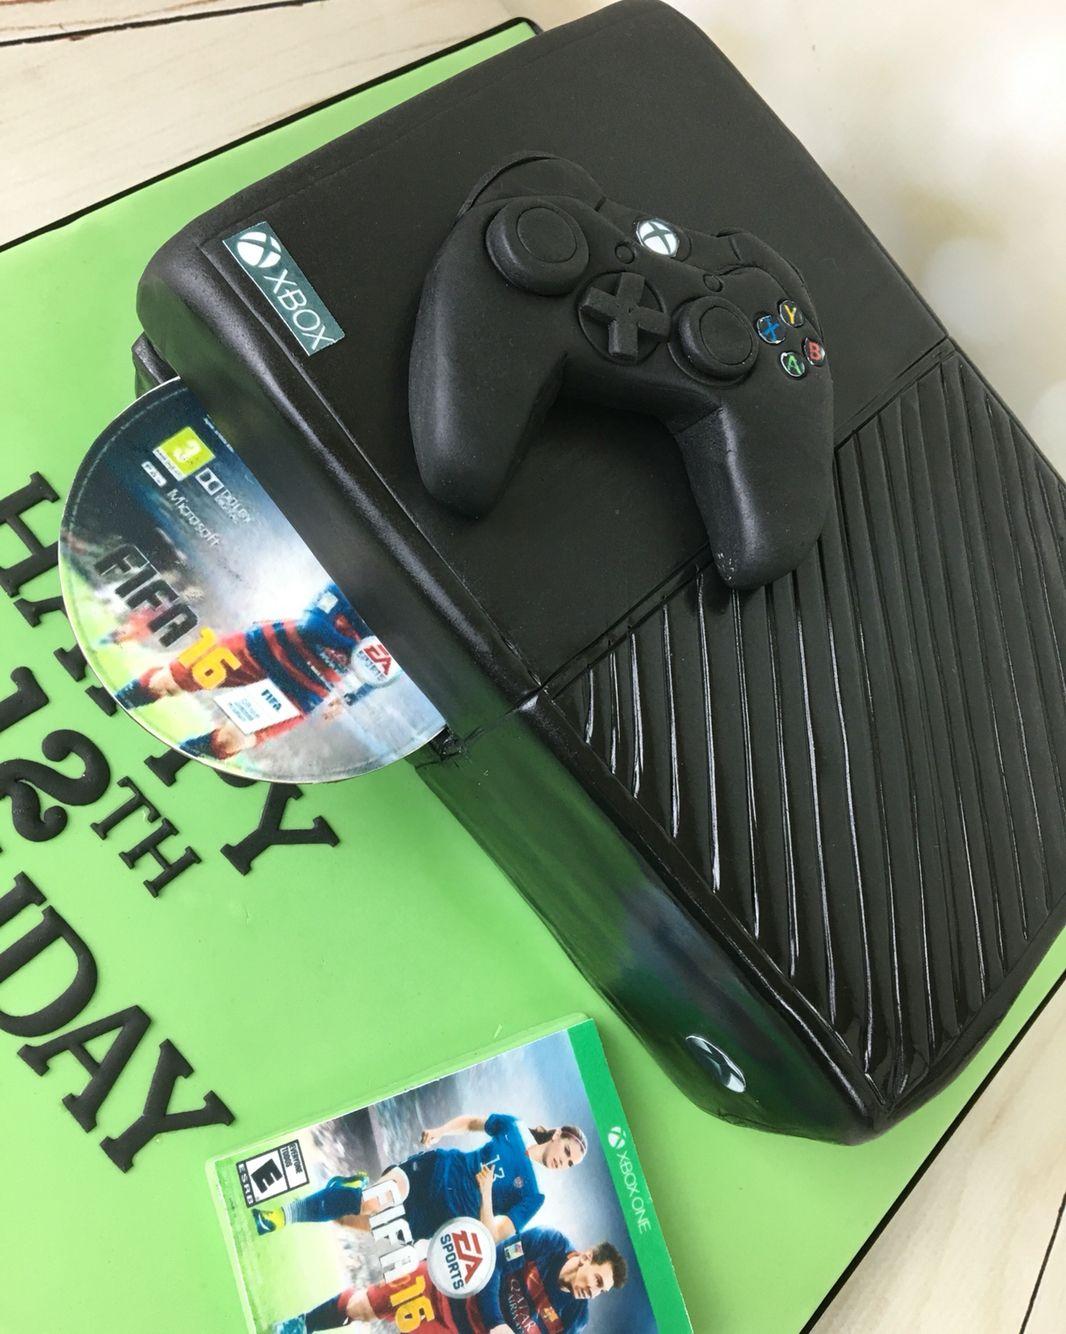 Xbox one birthday cake with Fifa 16 game birthday cakes